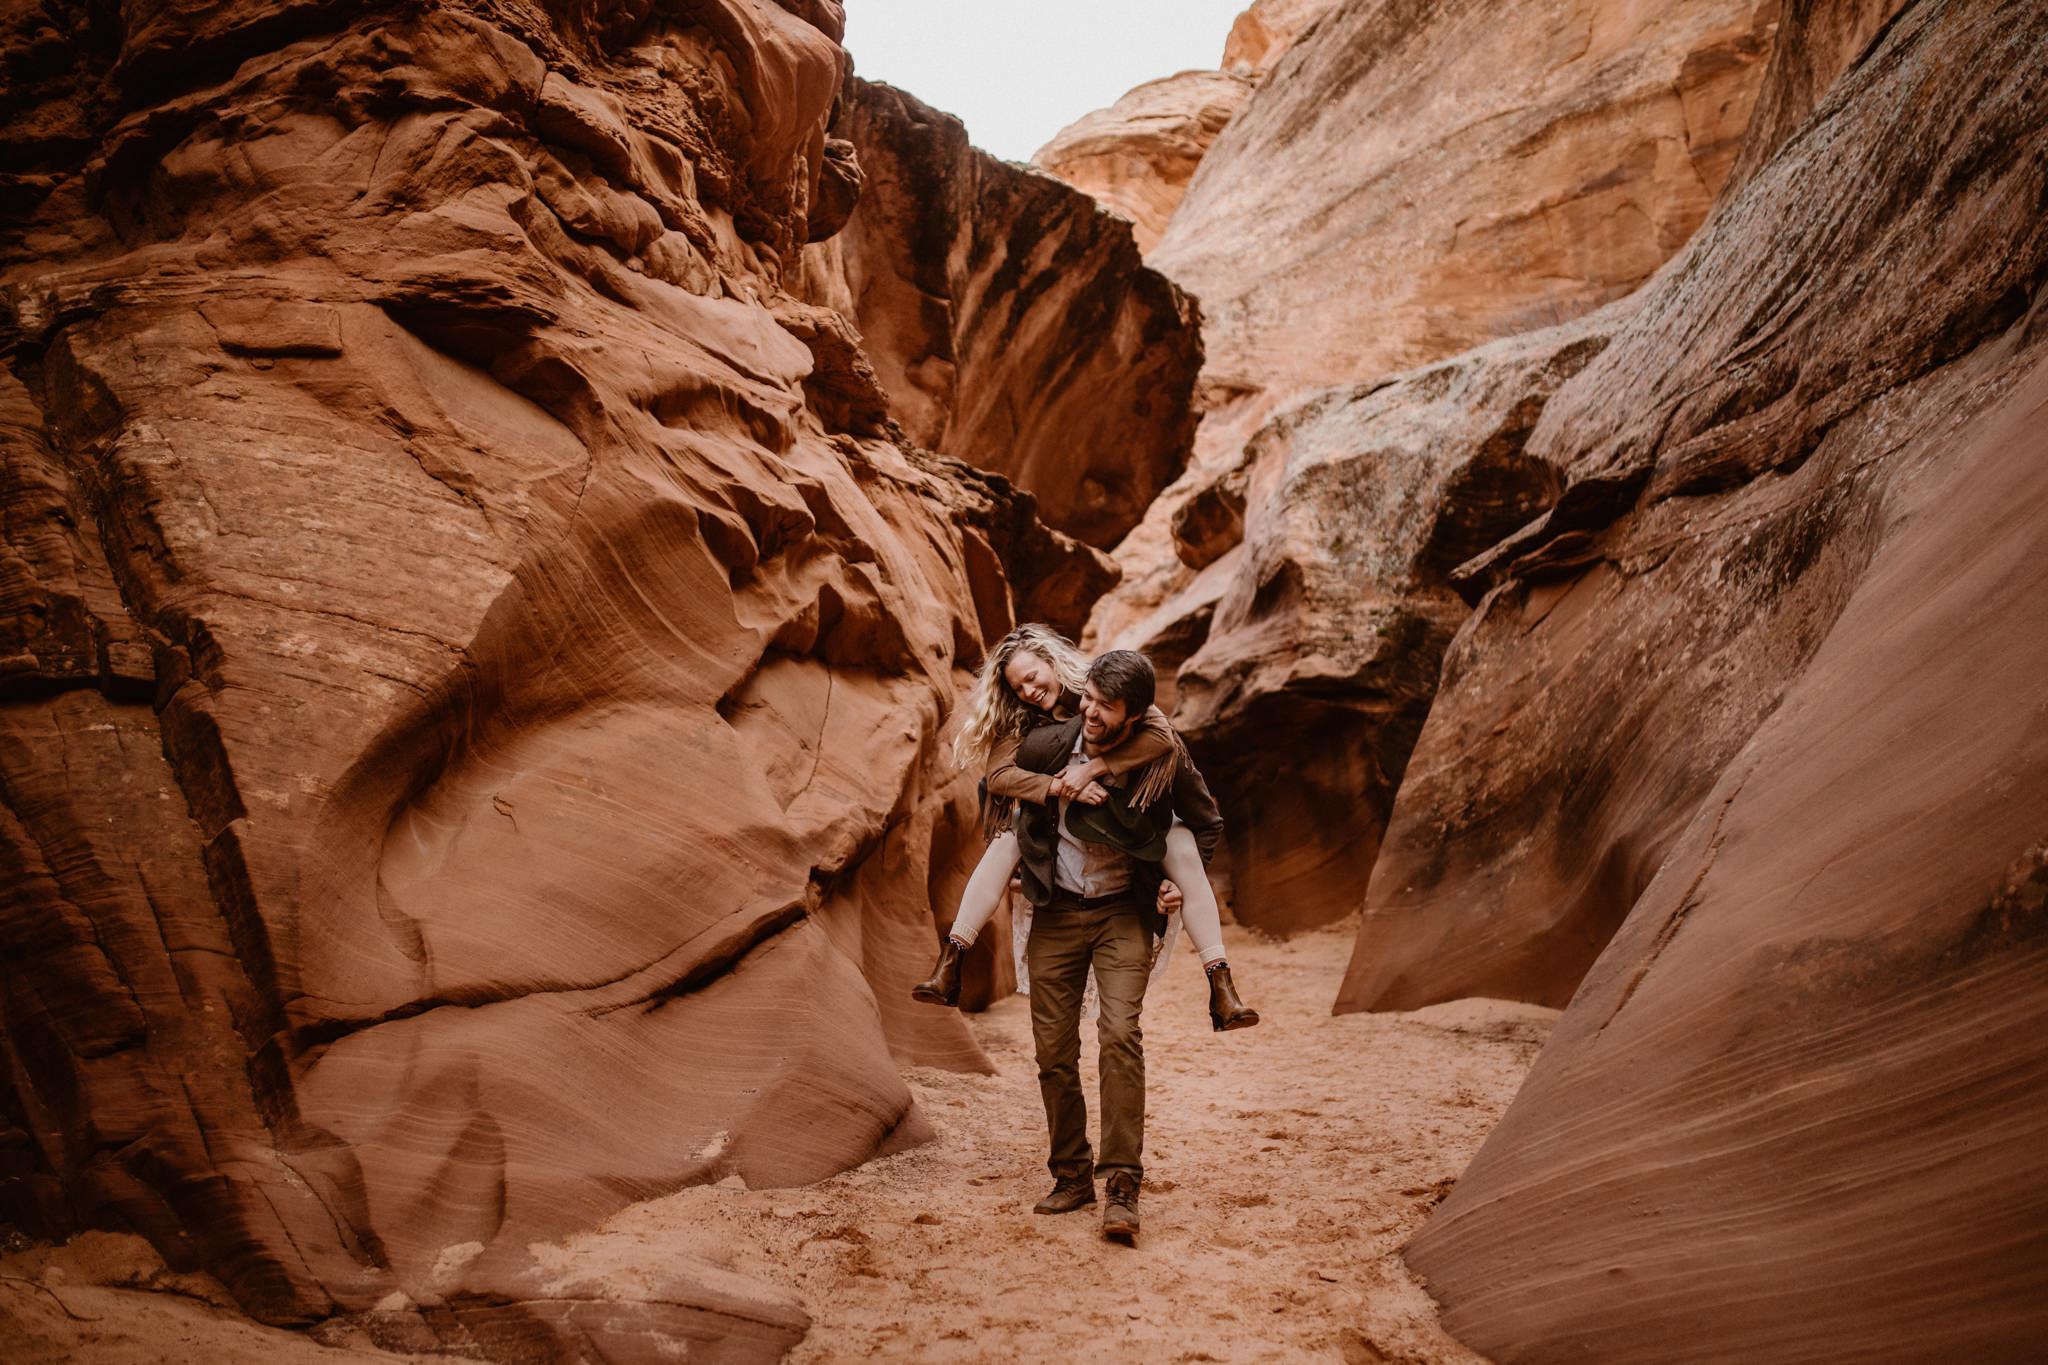 Lake Powell adventure wedding | desert elopement inspiration | Arizona wedding and elopement photographer